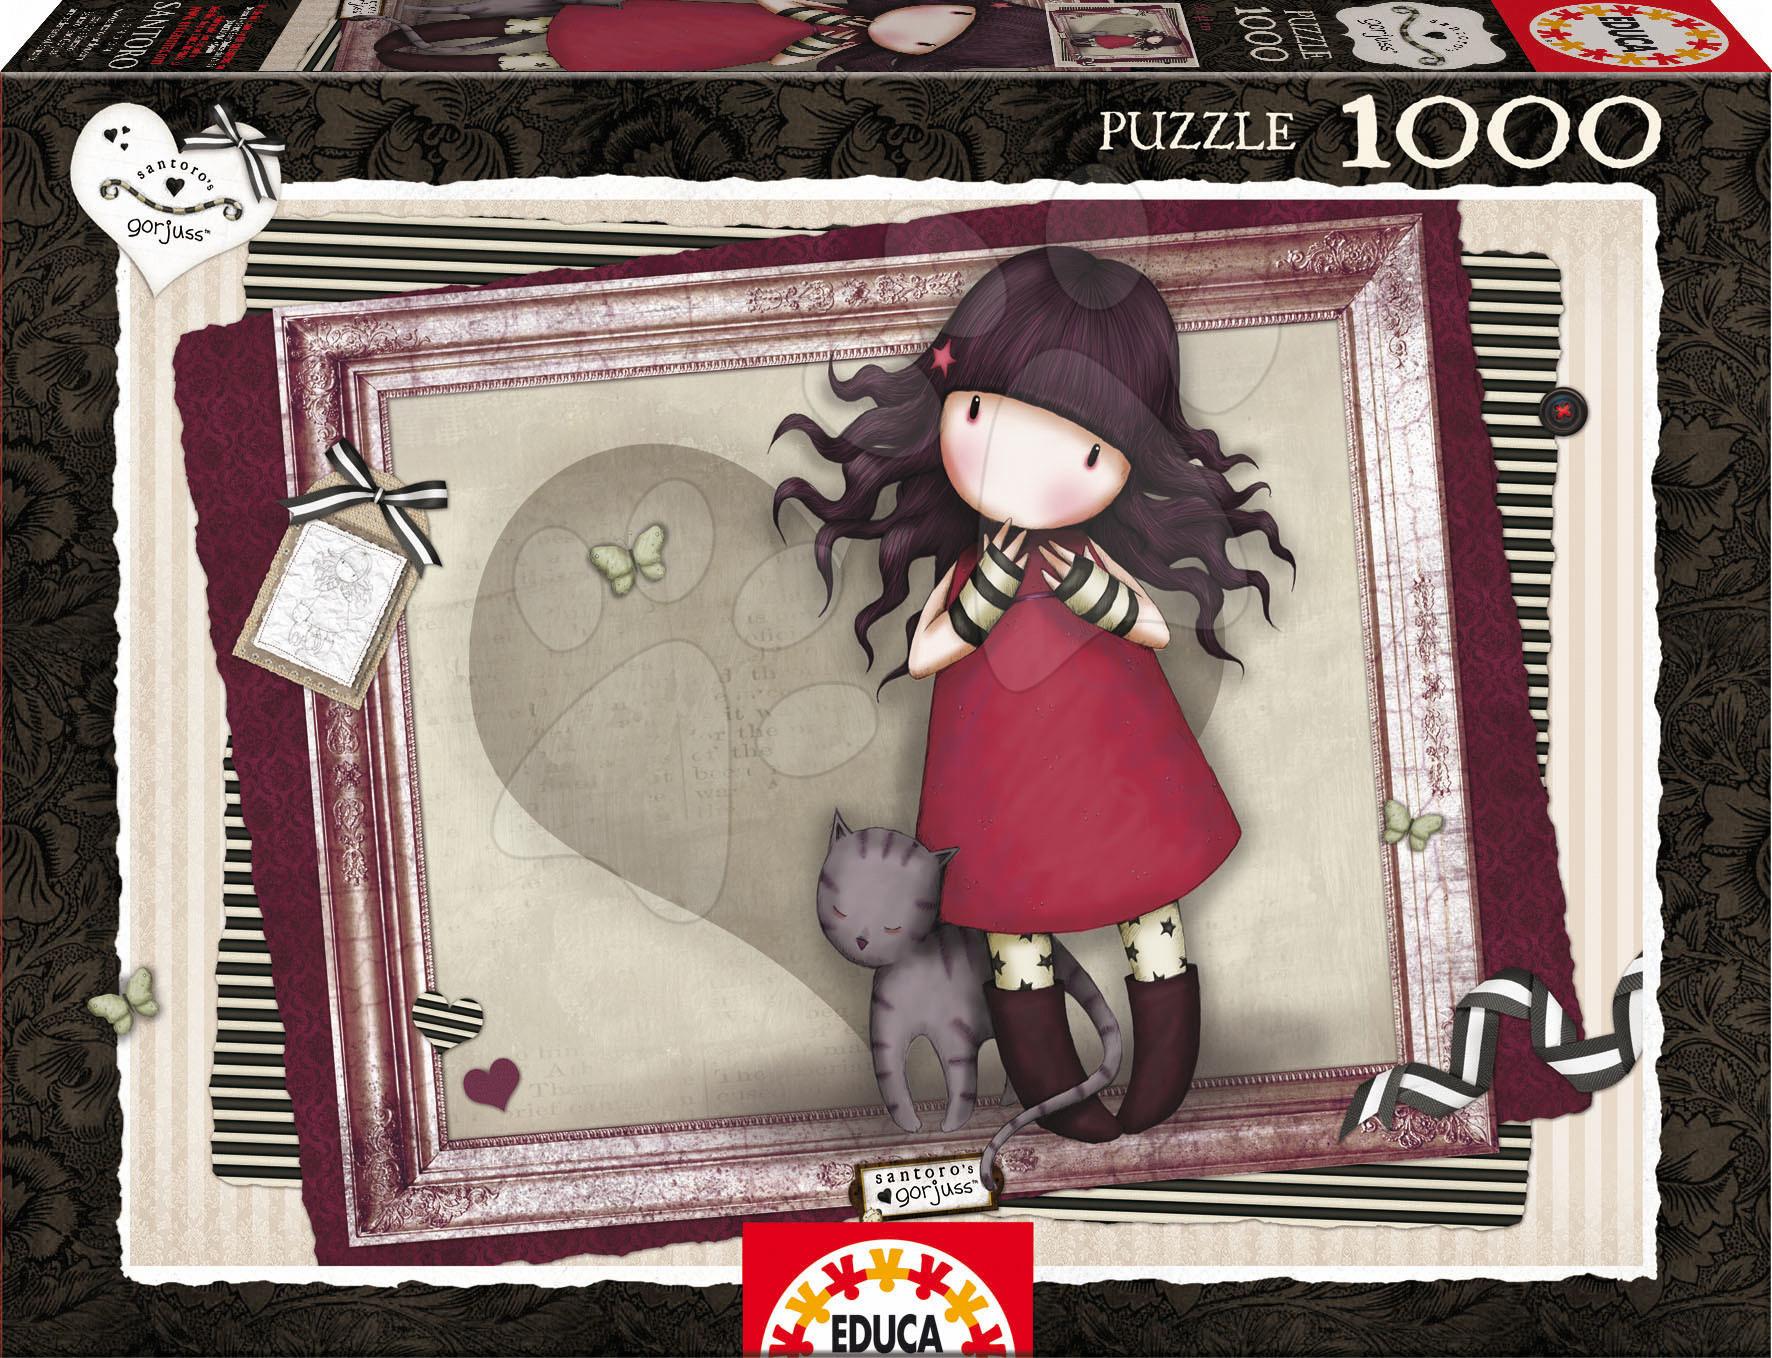 Puzzle Santoro Gorjuss Purfect Love Educa 1000 dílů od 12 let